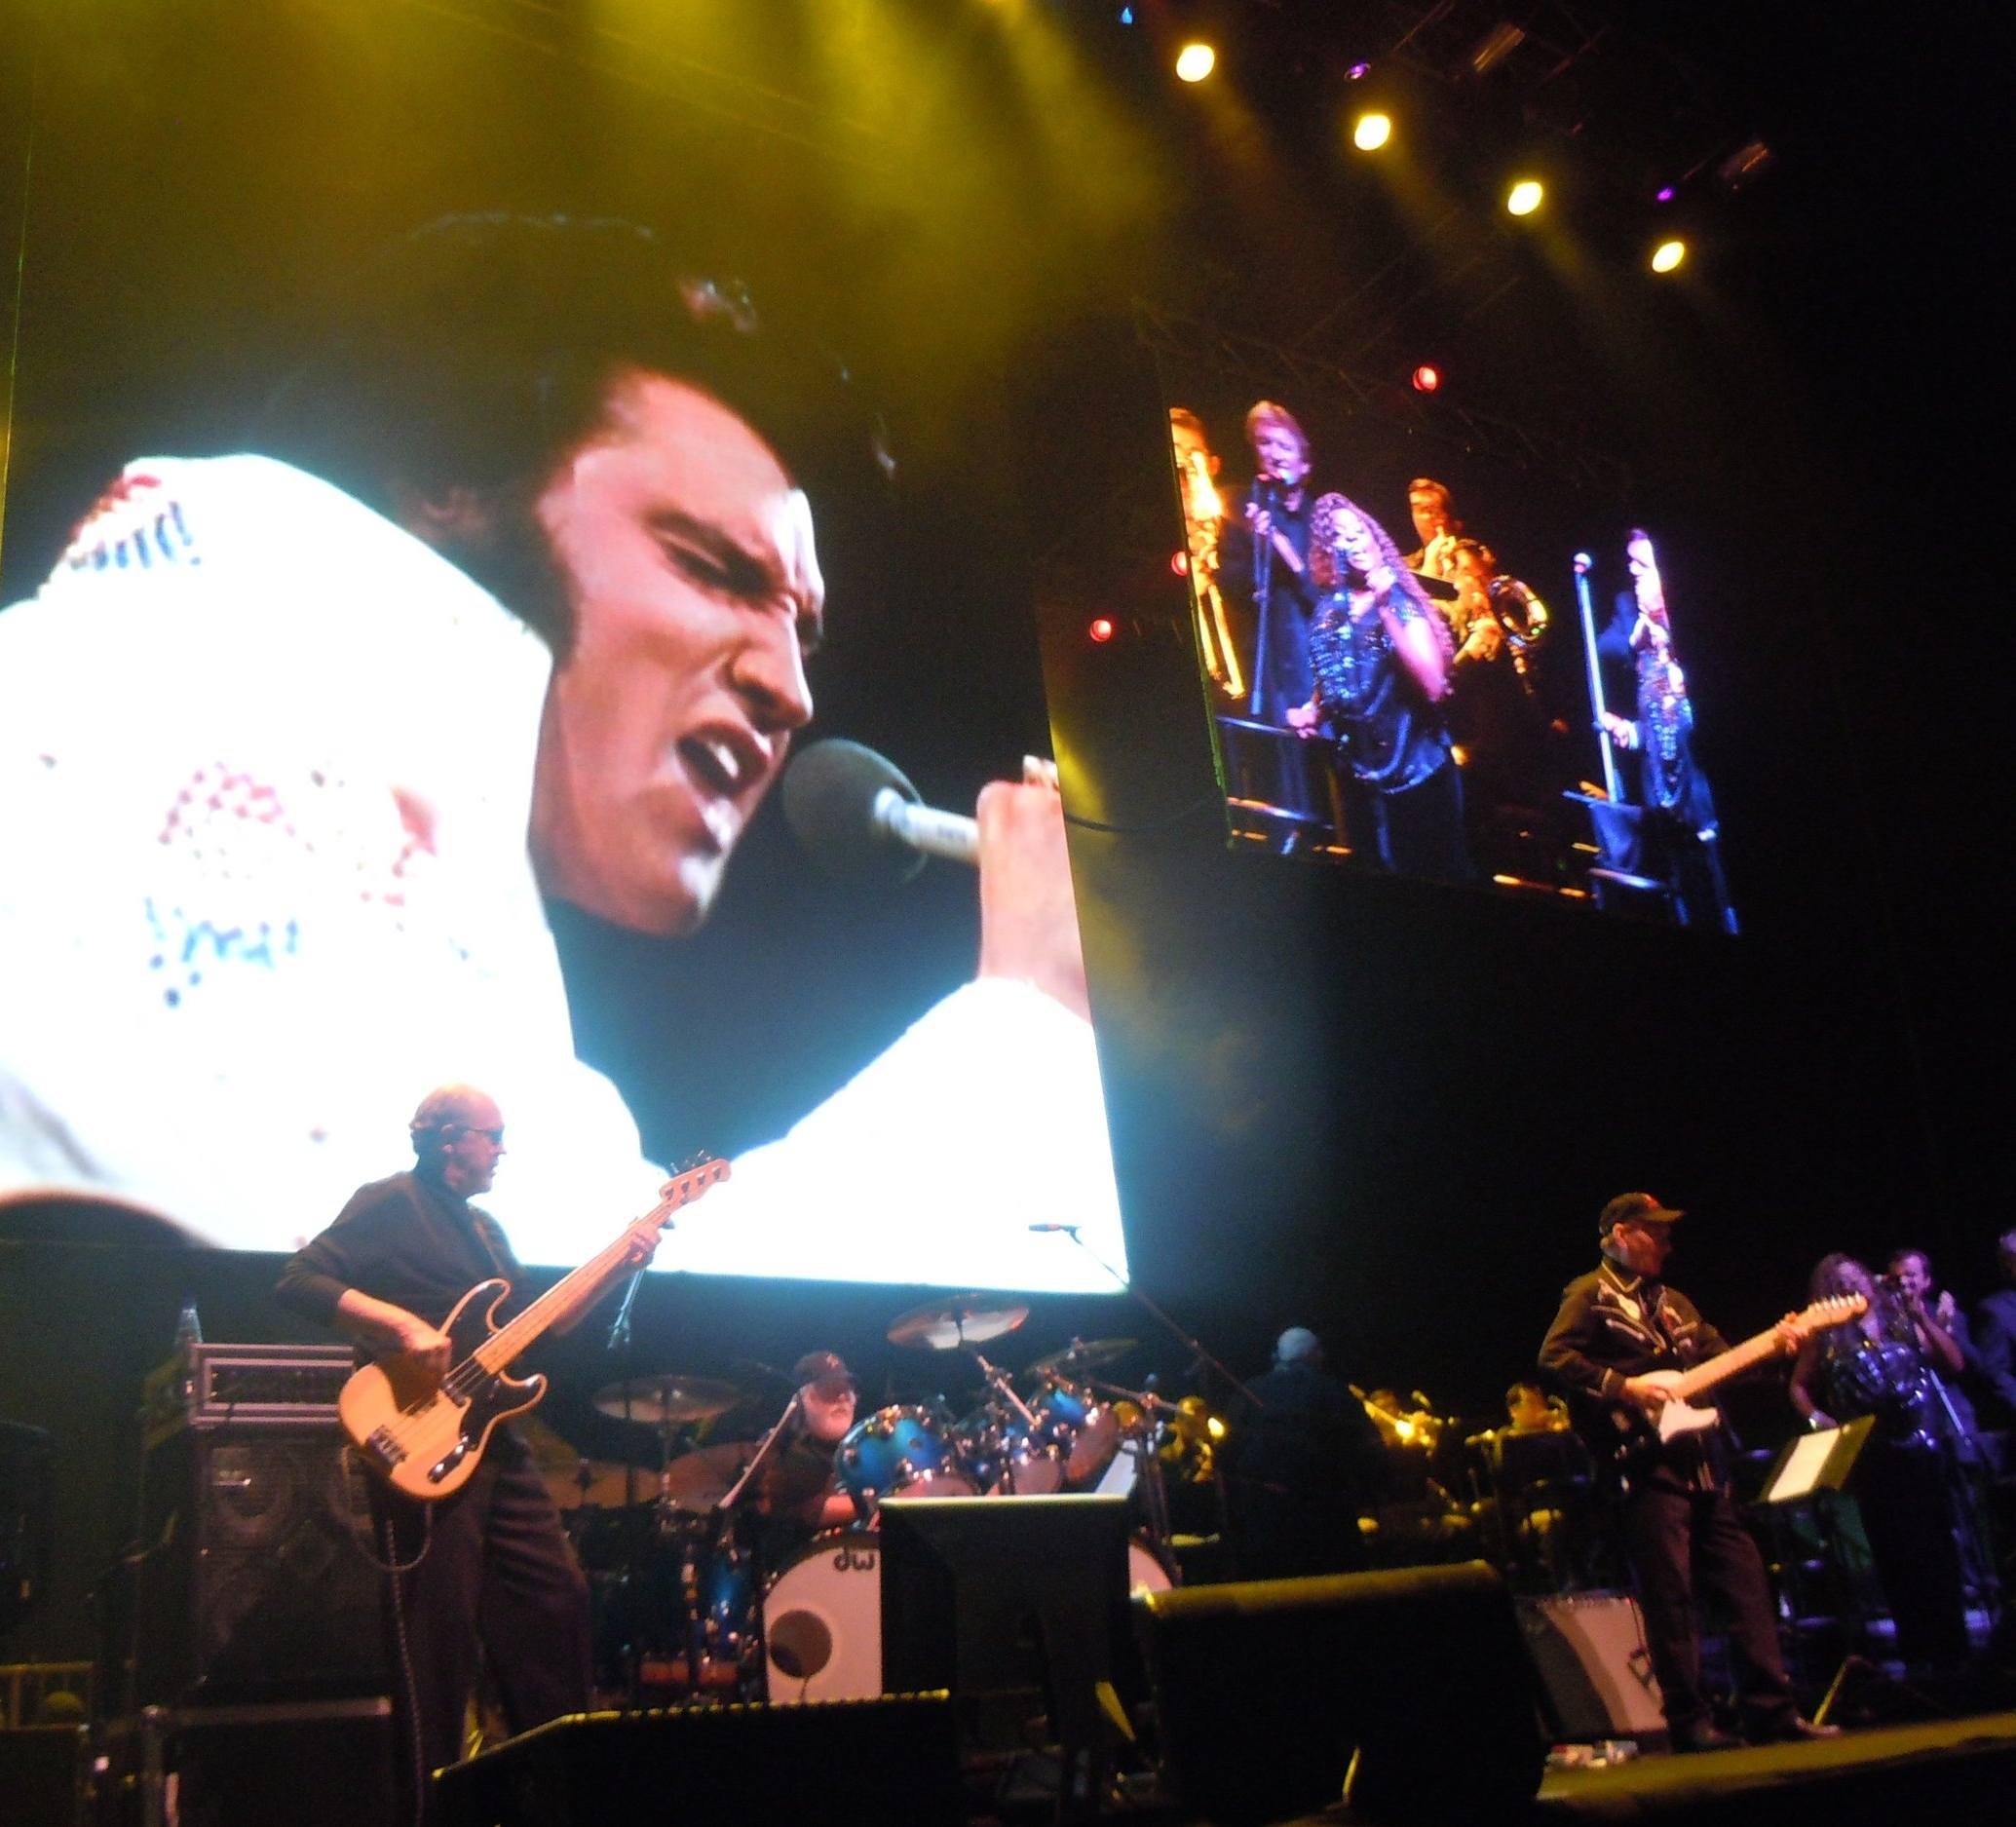 Elvis in Concert, Brazil